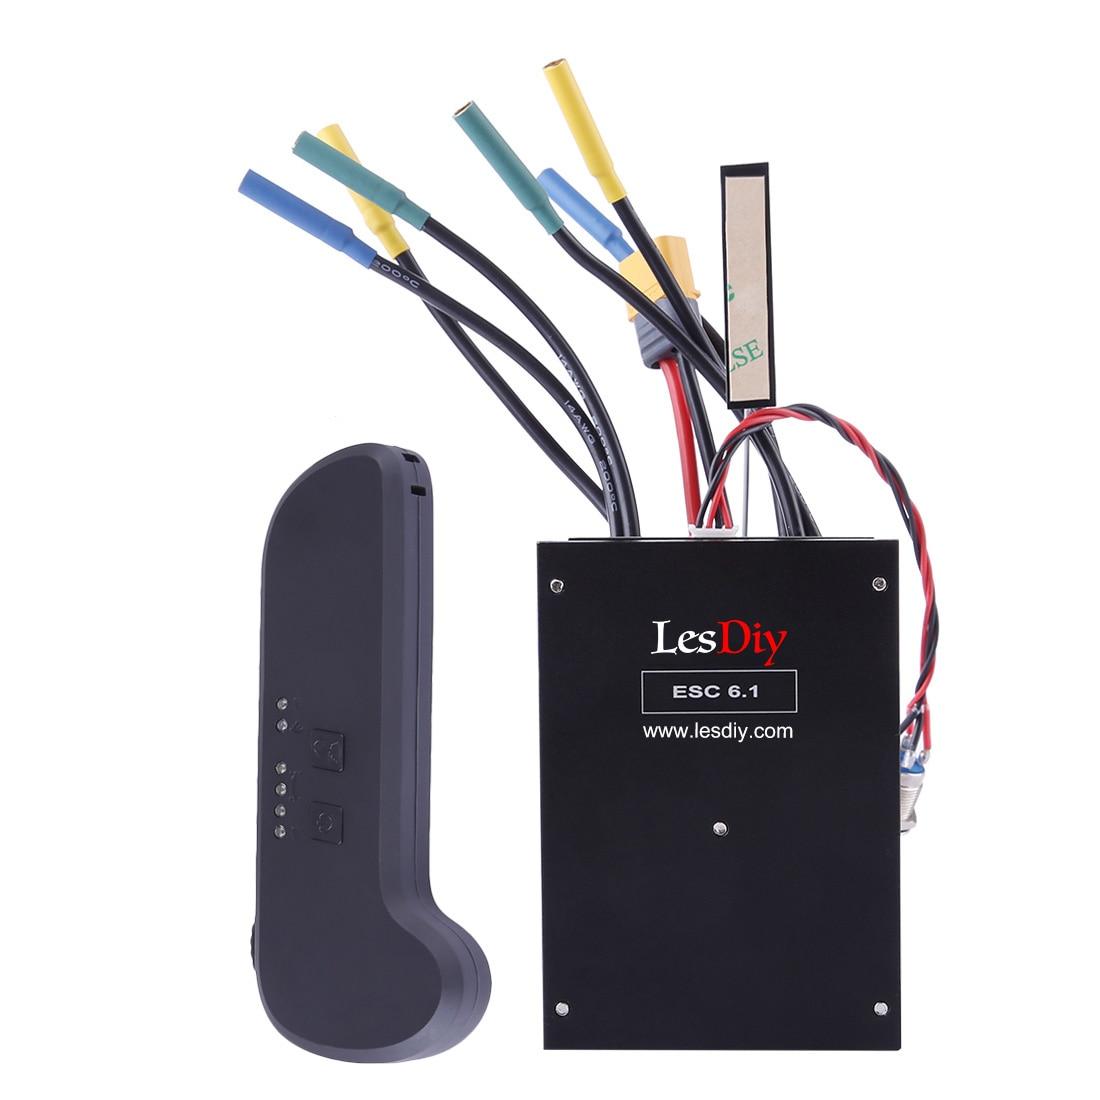 Hohe Qualität Elektrische Roller ESC6.1 Dual Stick ESC 100A 8-60V 3 S-12 S Batterie für 4-rad Elektrische Roller Skateboard